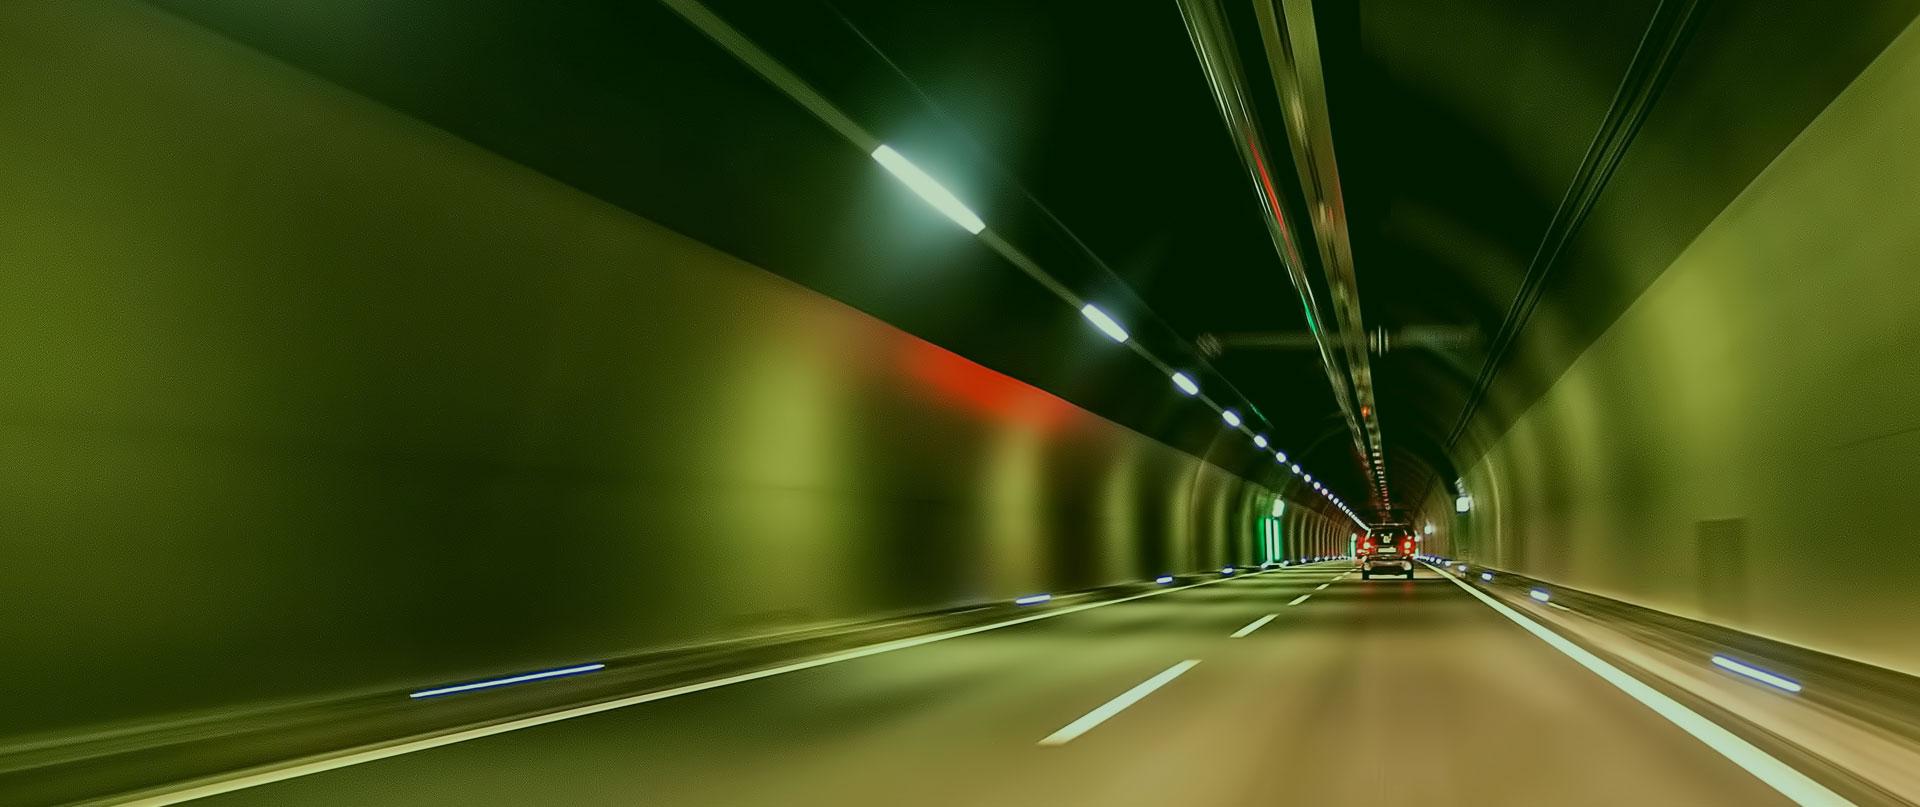 tunnelling slide